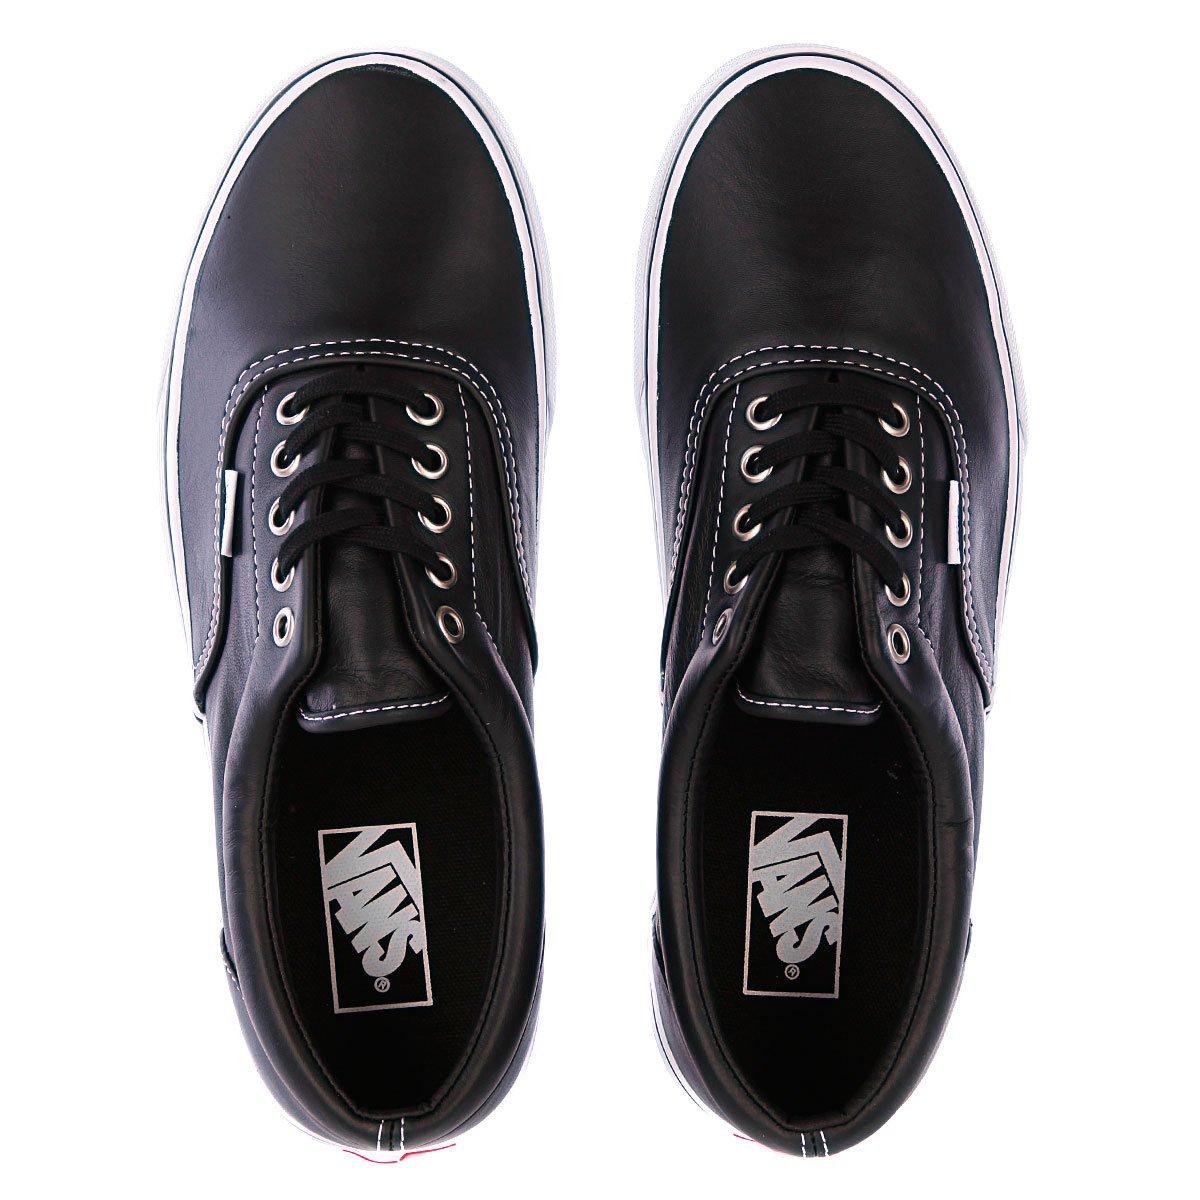 Leather Shoes  Shop Leather Shoes at Vans